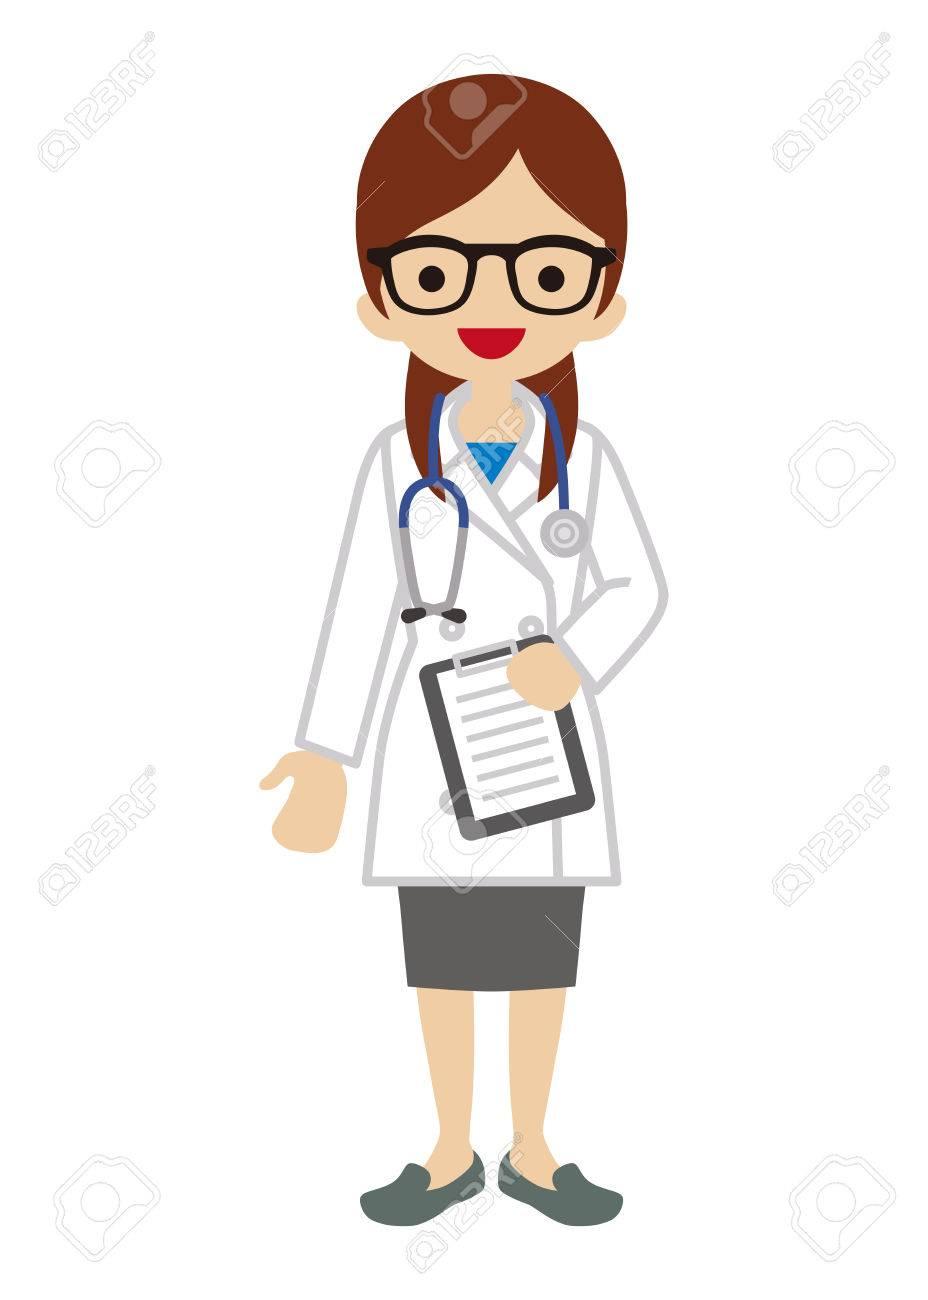 female doctor clipart #9